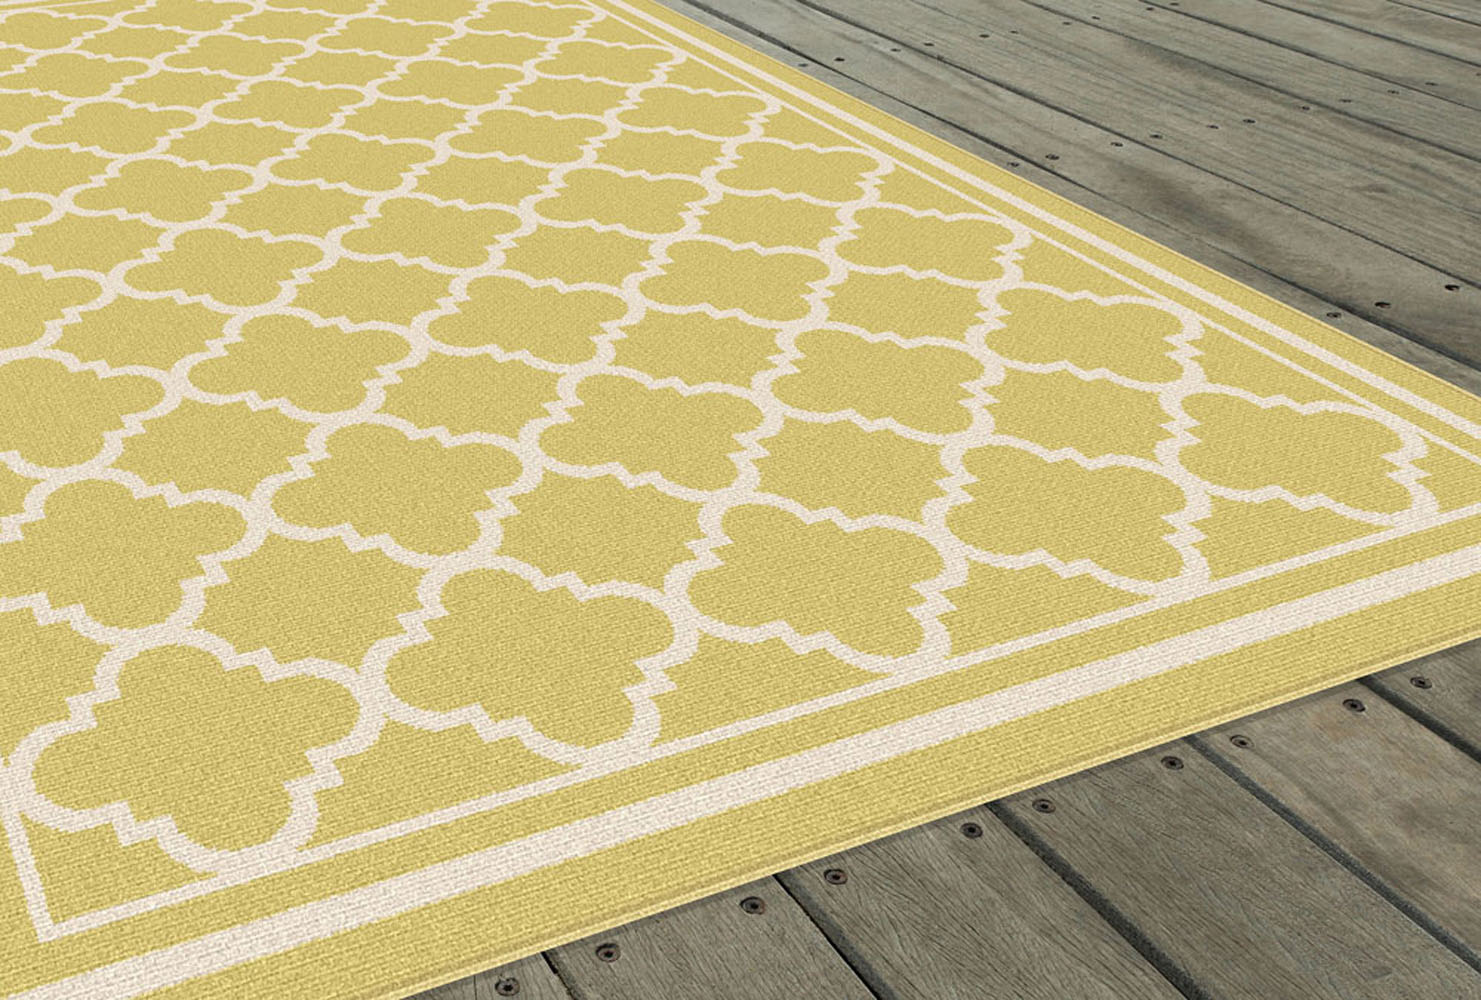 Garden City Yellow Transitional Moroccan Outdoor Geometric